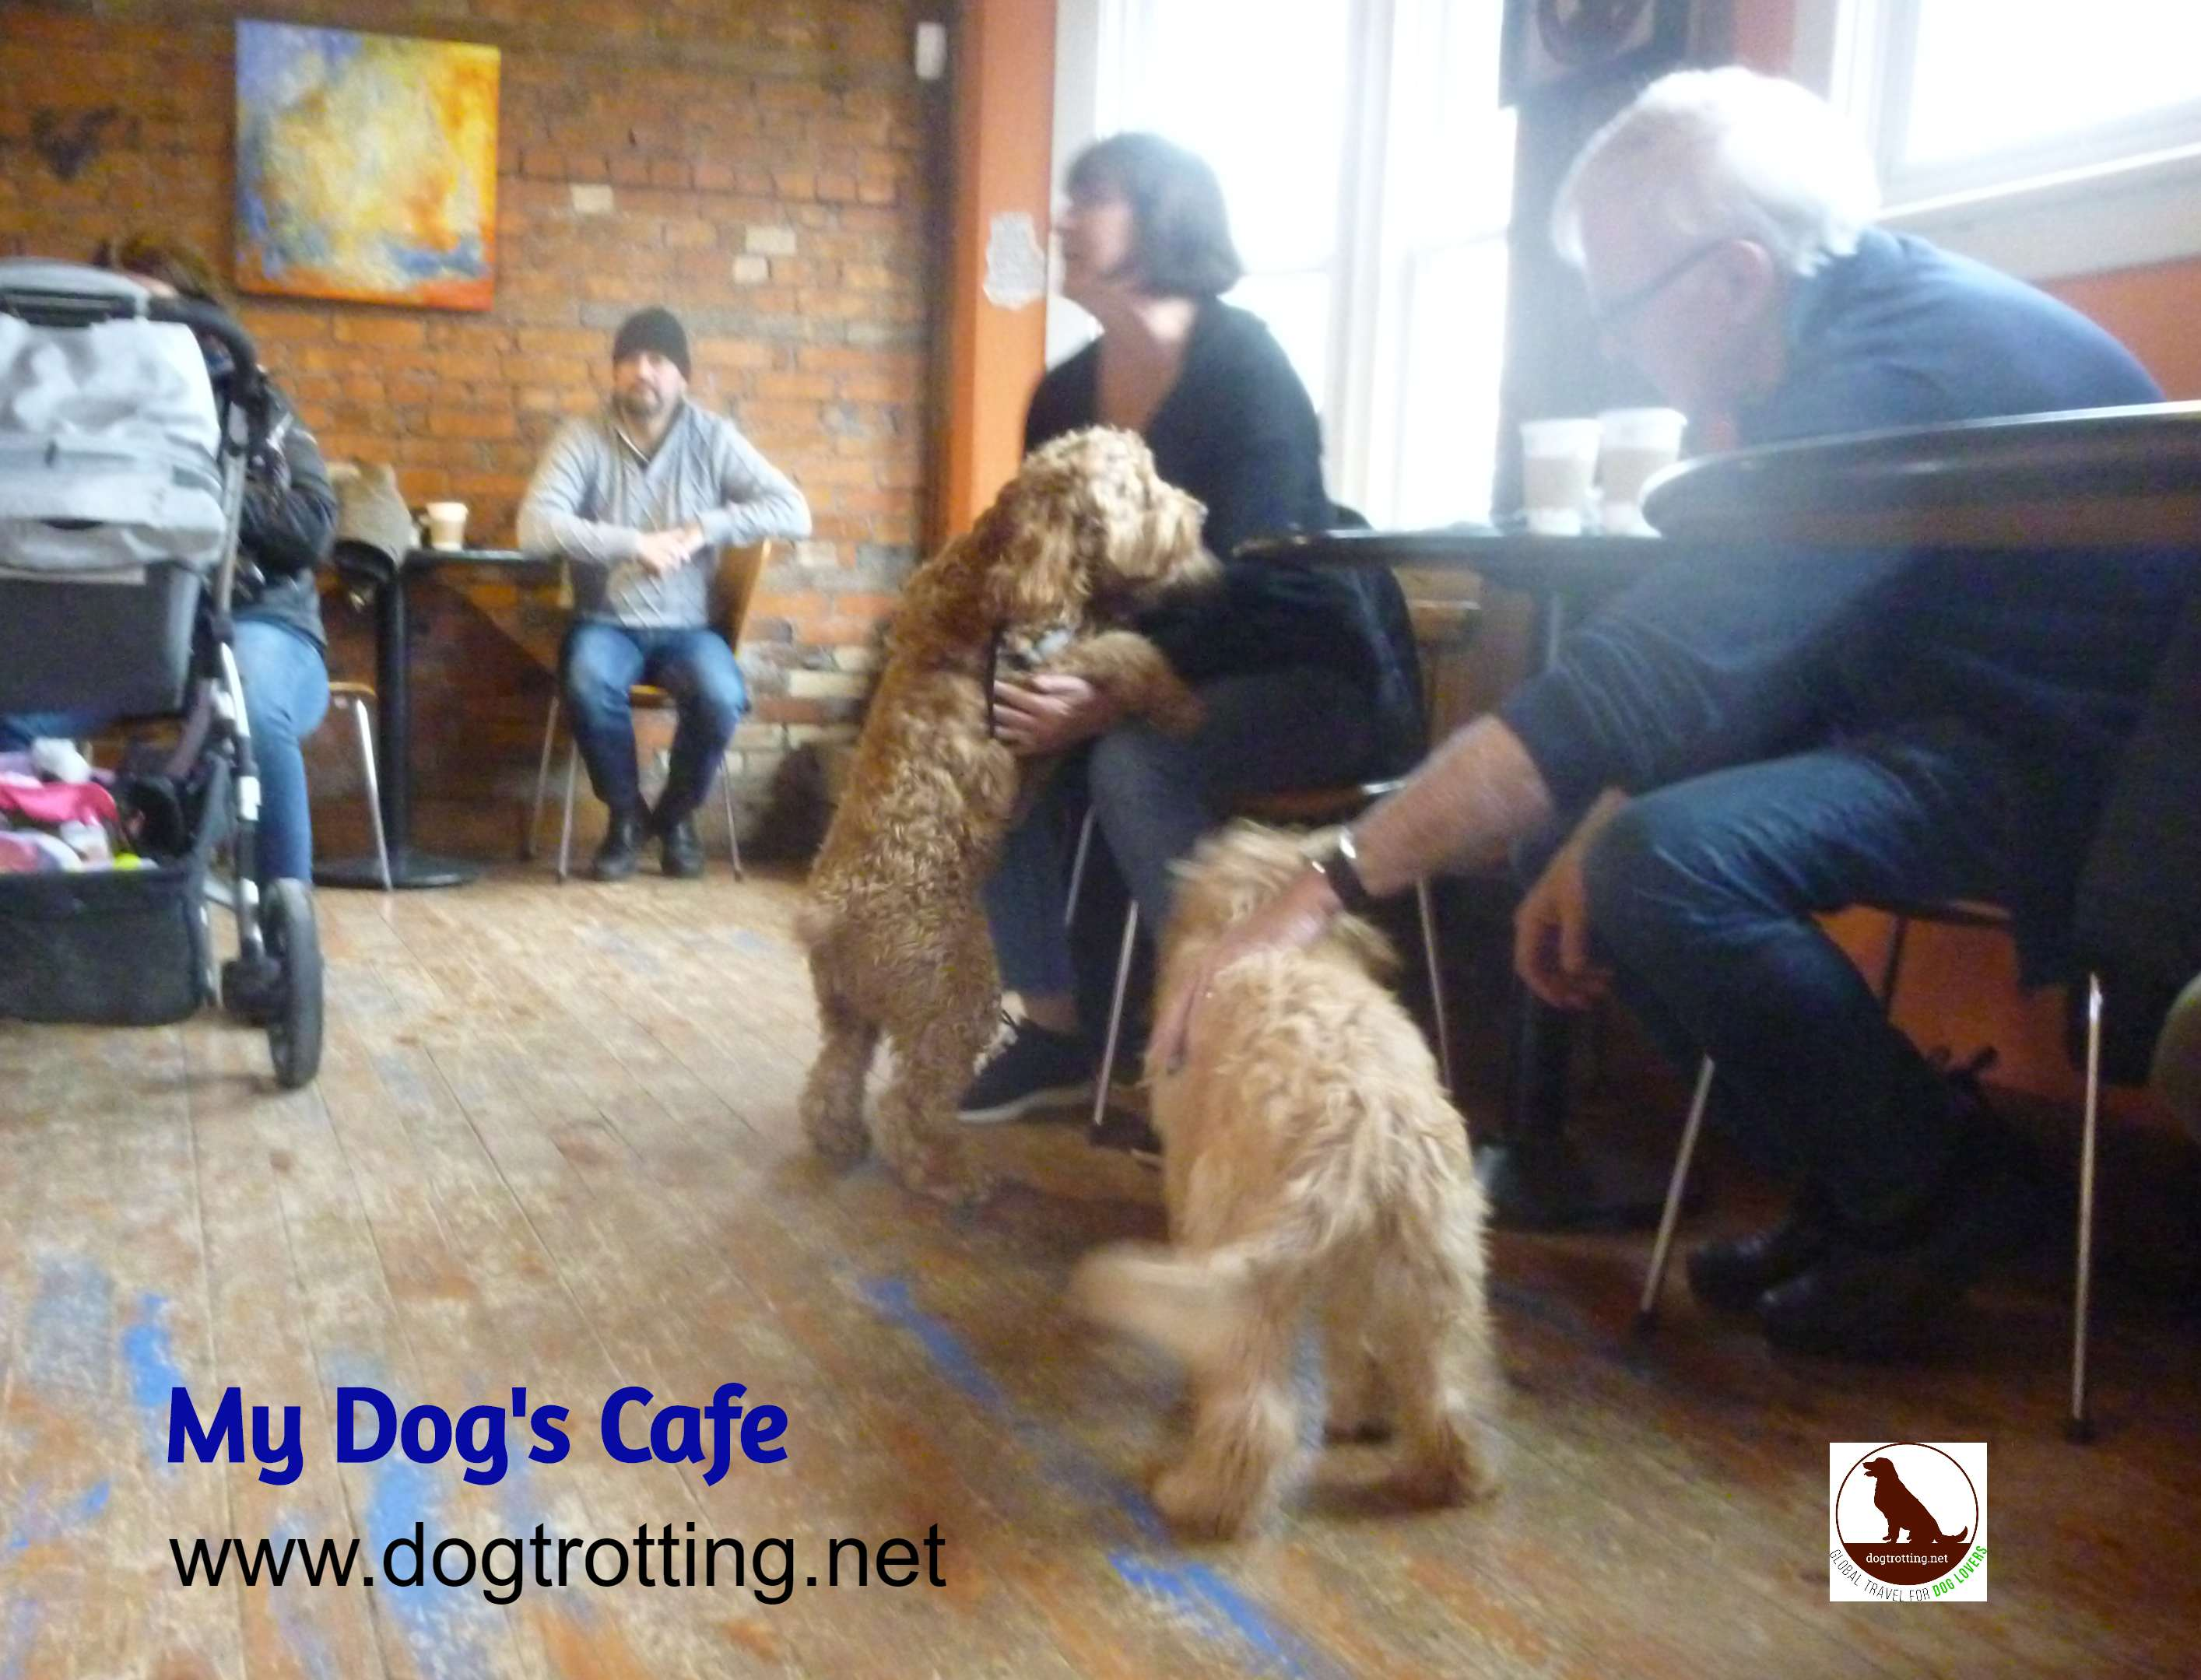 inside My Dog's Cafe in Hamilton Ontario